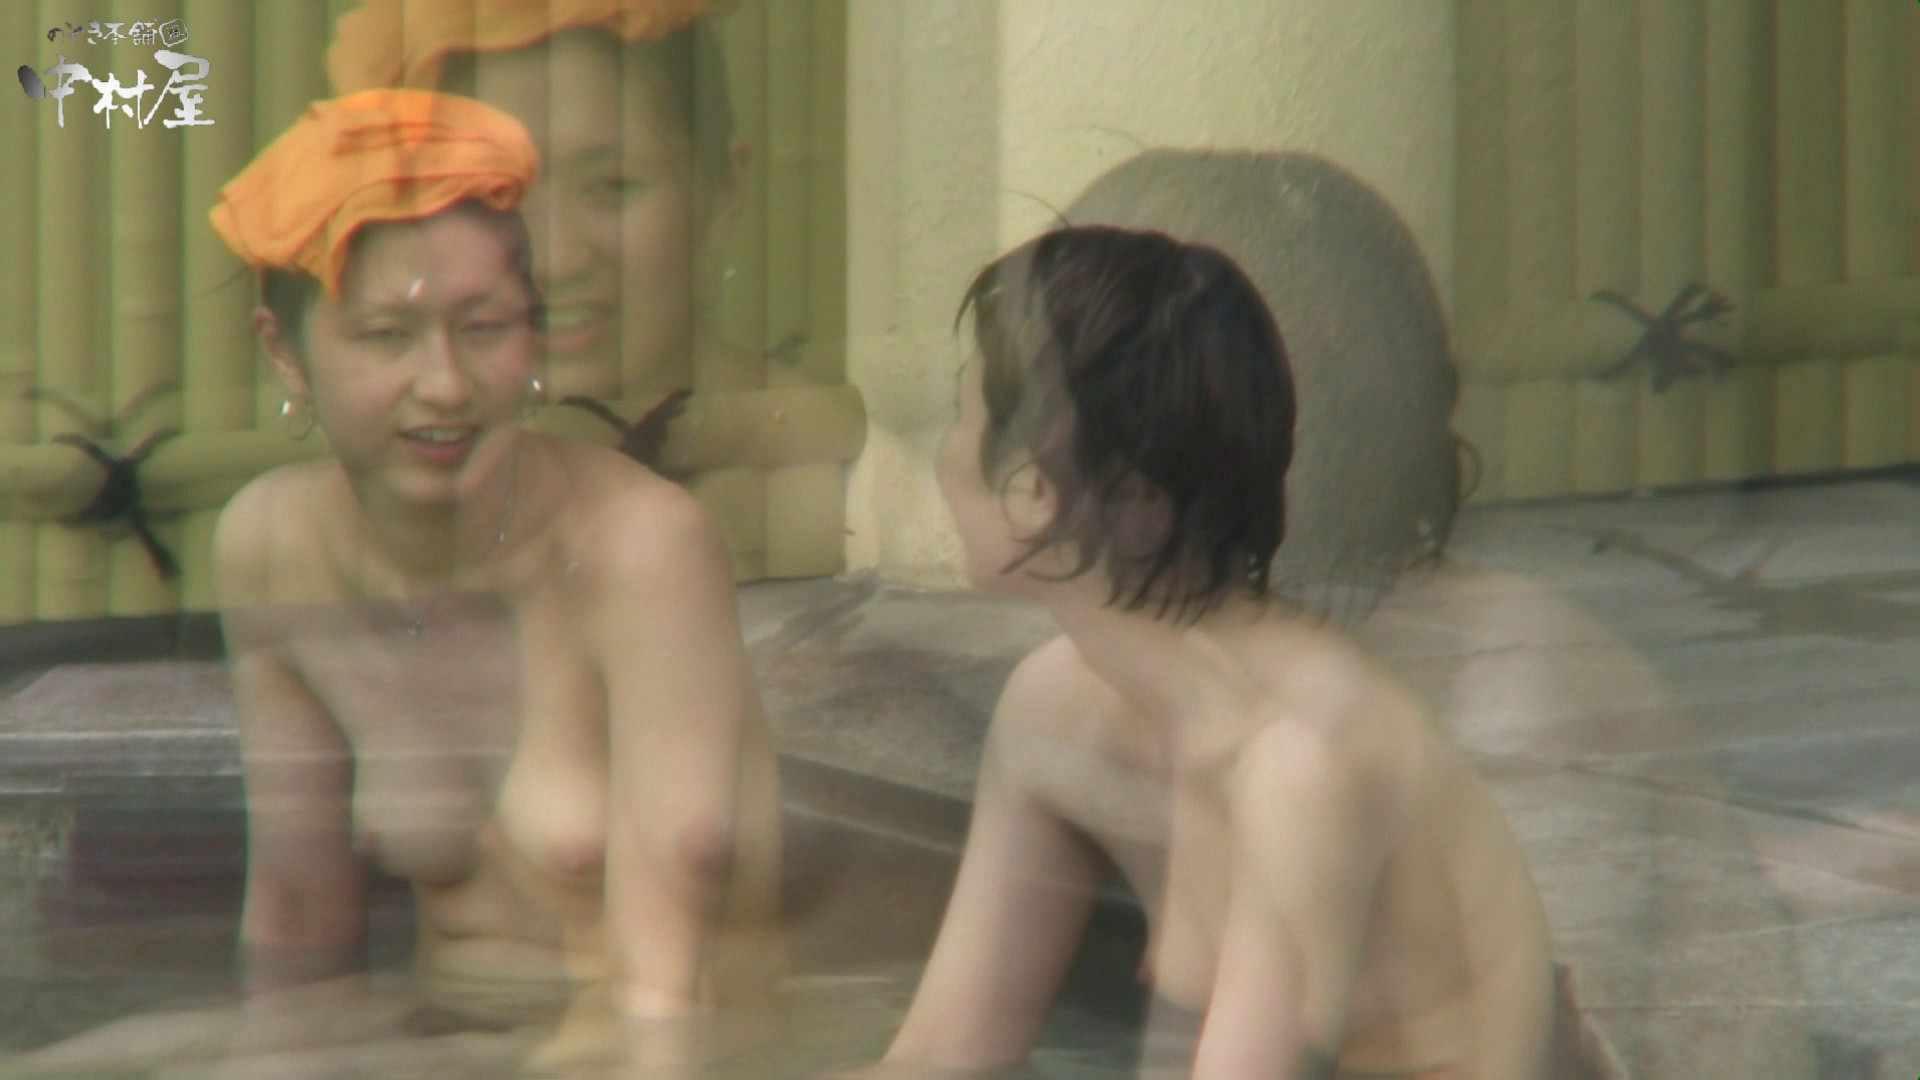 Aquaな露天風呂Vol.945 盗撮 | OLエロ画像  60PICs 52